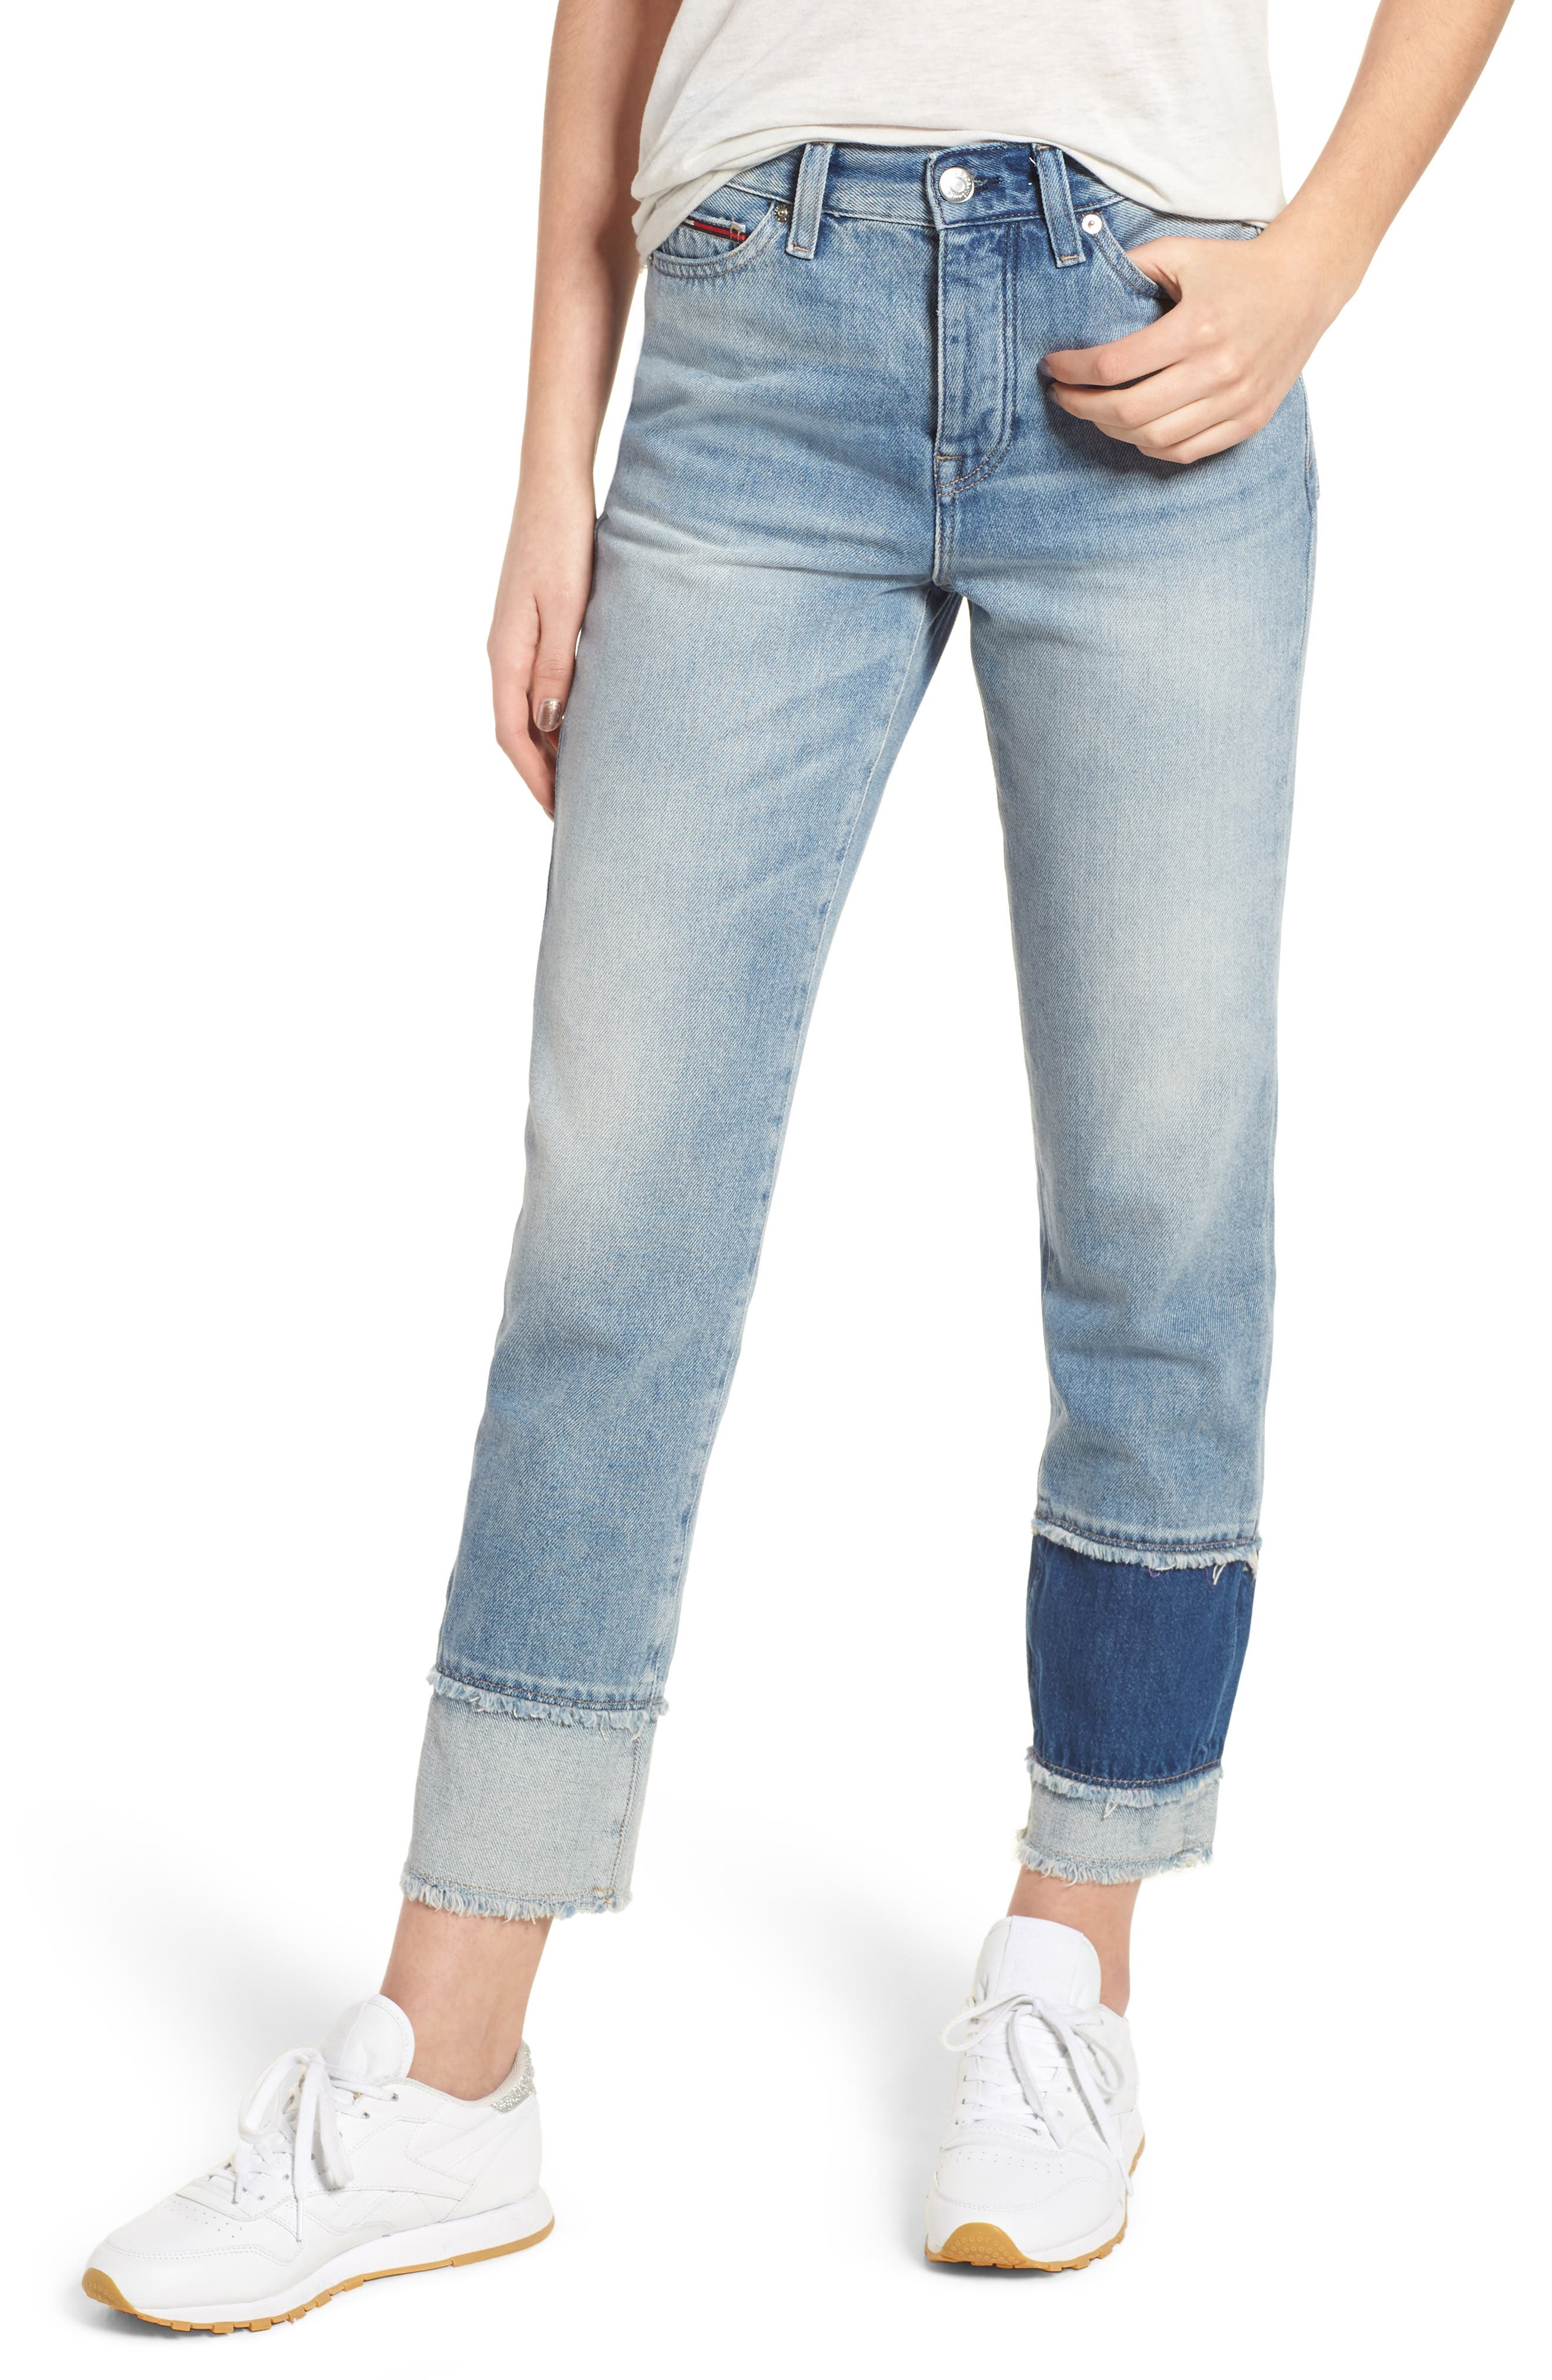 Izzy Layered Cuff Slim Leg Jeans,                         Main,                         color, Raw Patch Light Blue Rigid